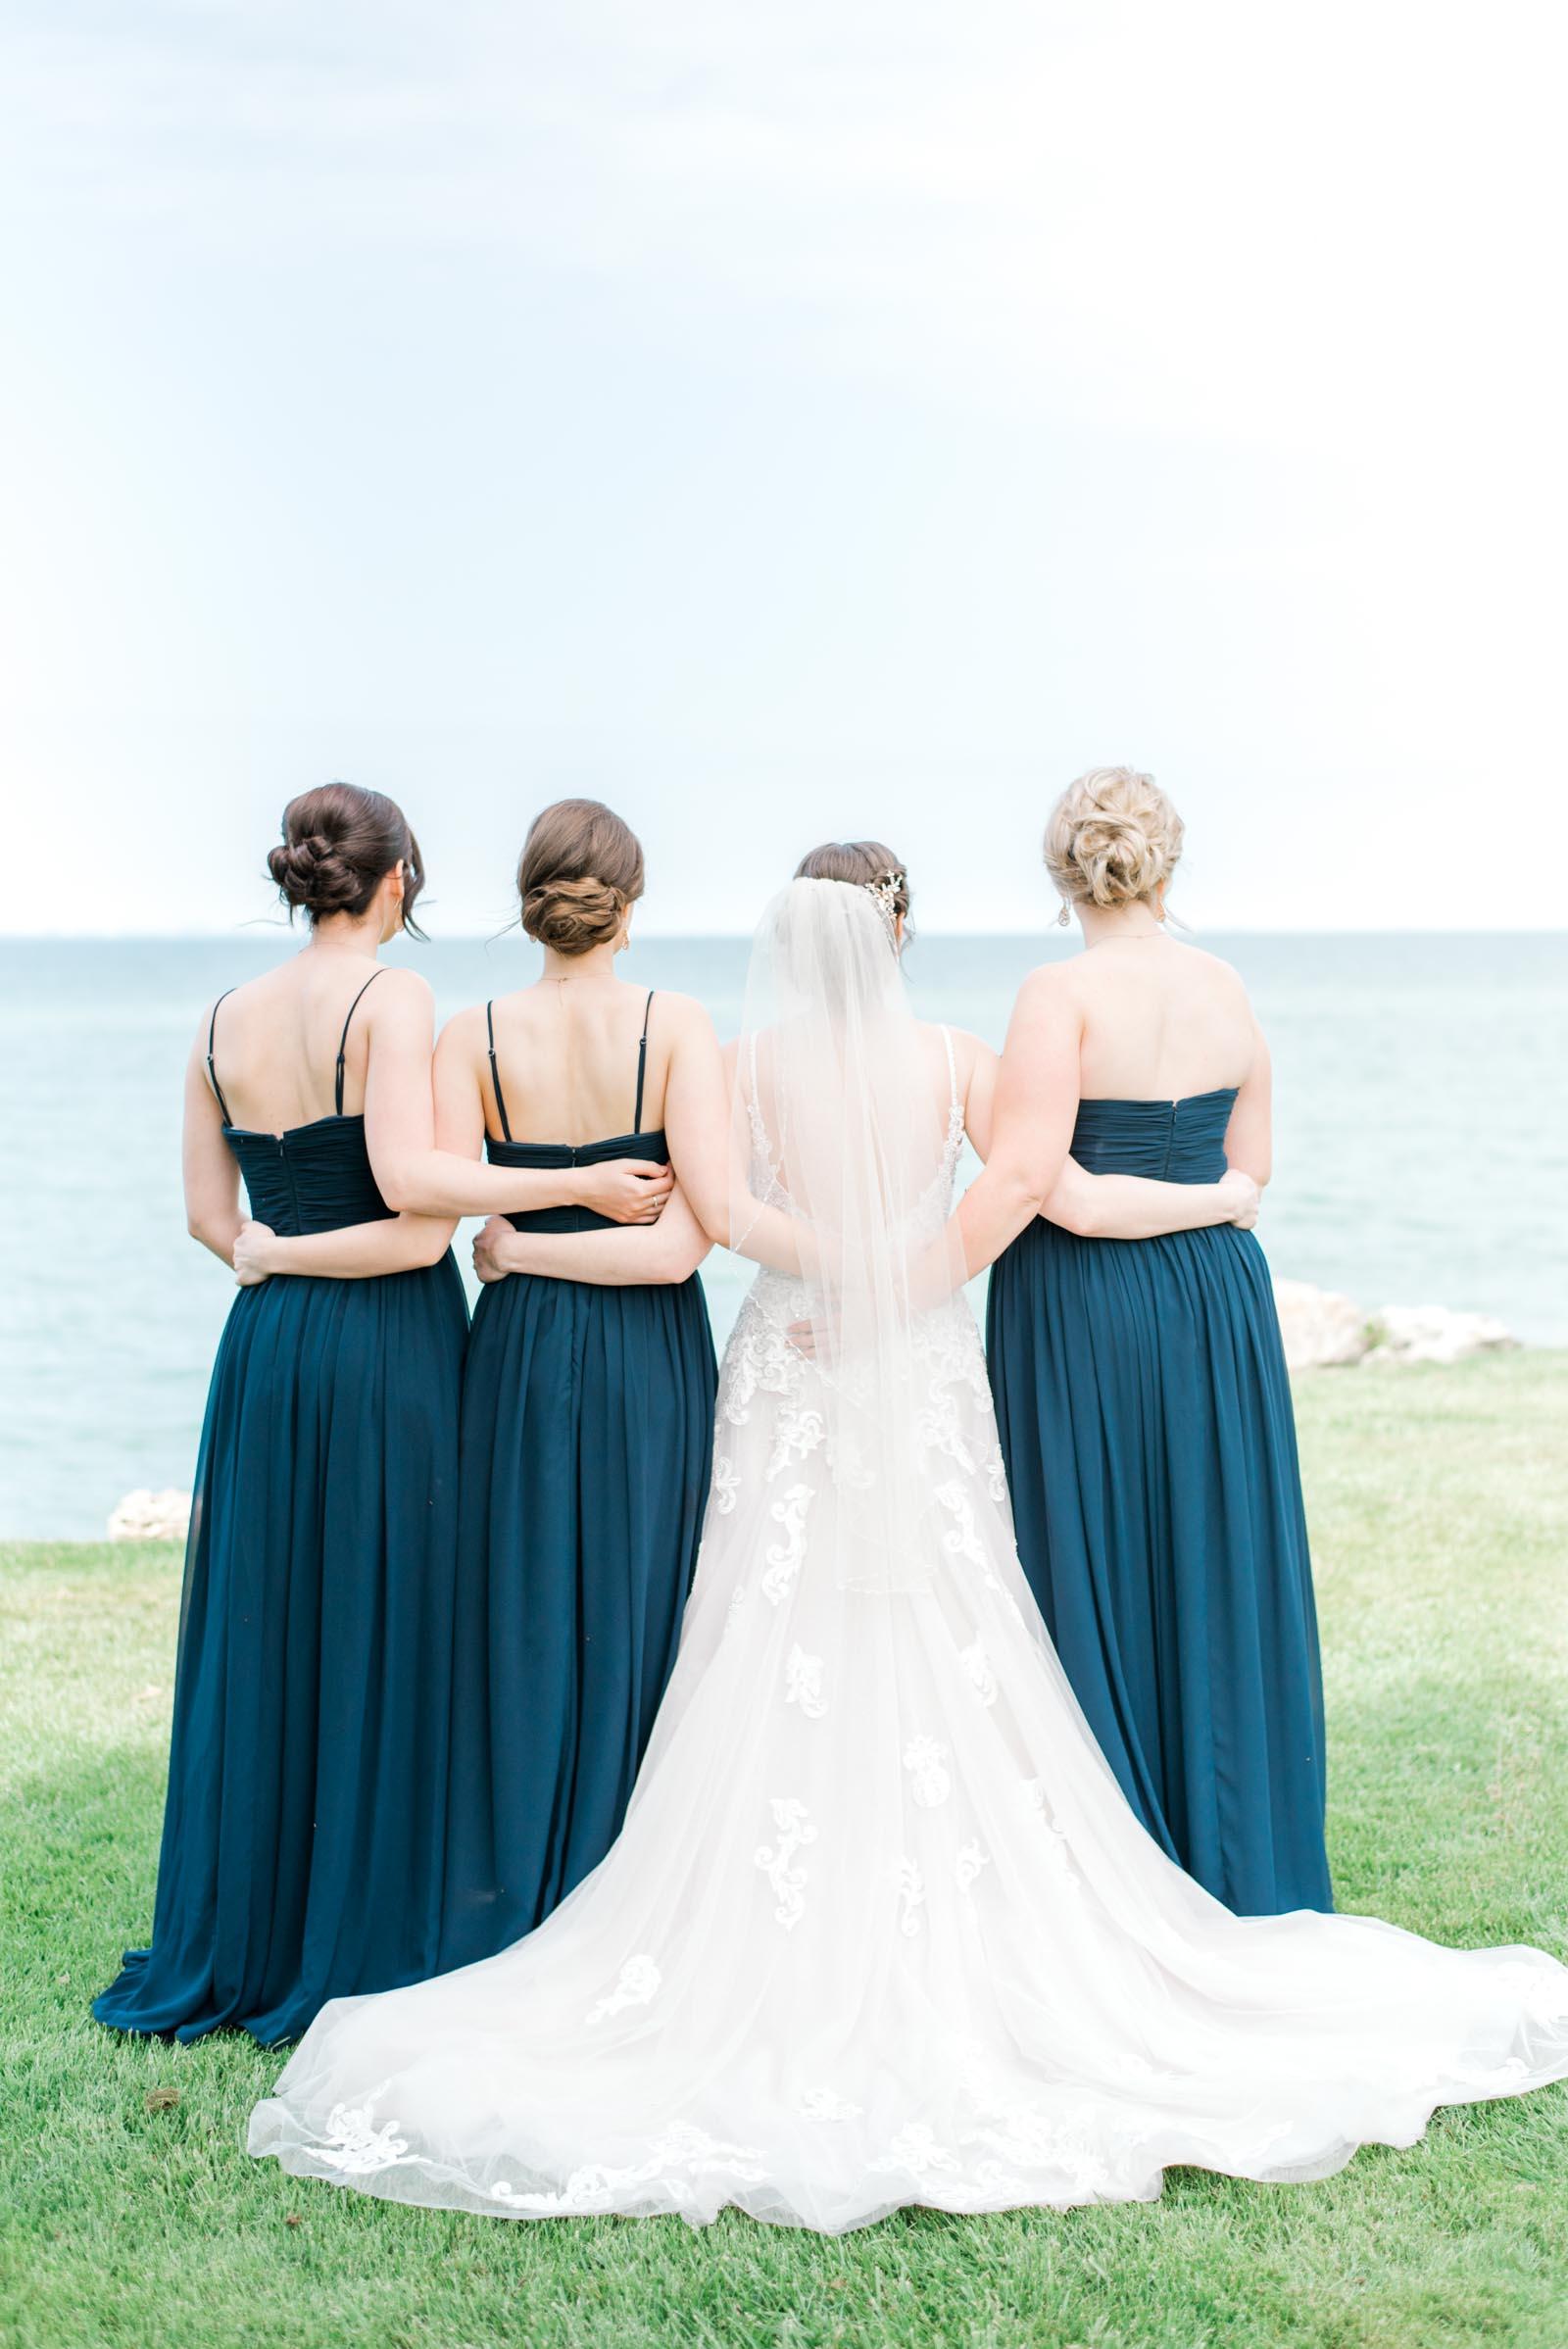 Edgewater Manor Wedding - Hamilton Wedding Photography - Justine & Mark-29.jpg